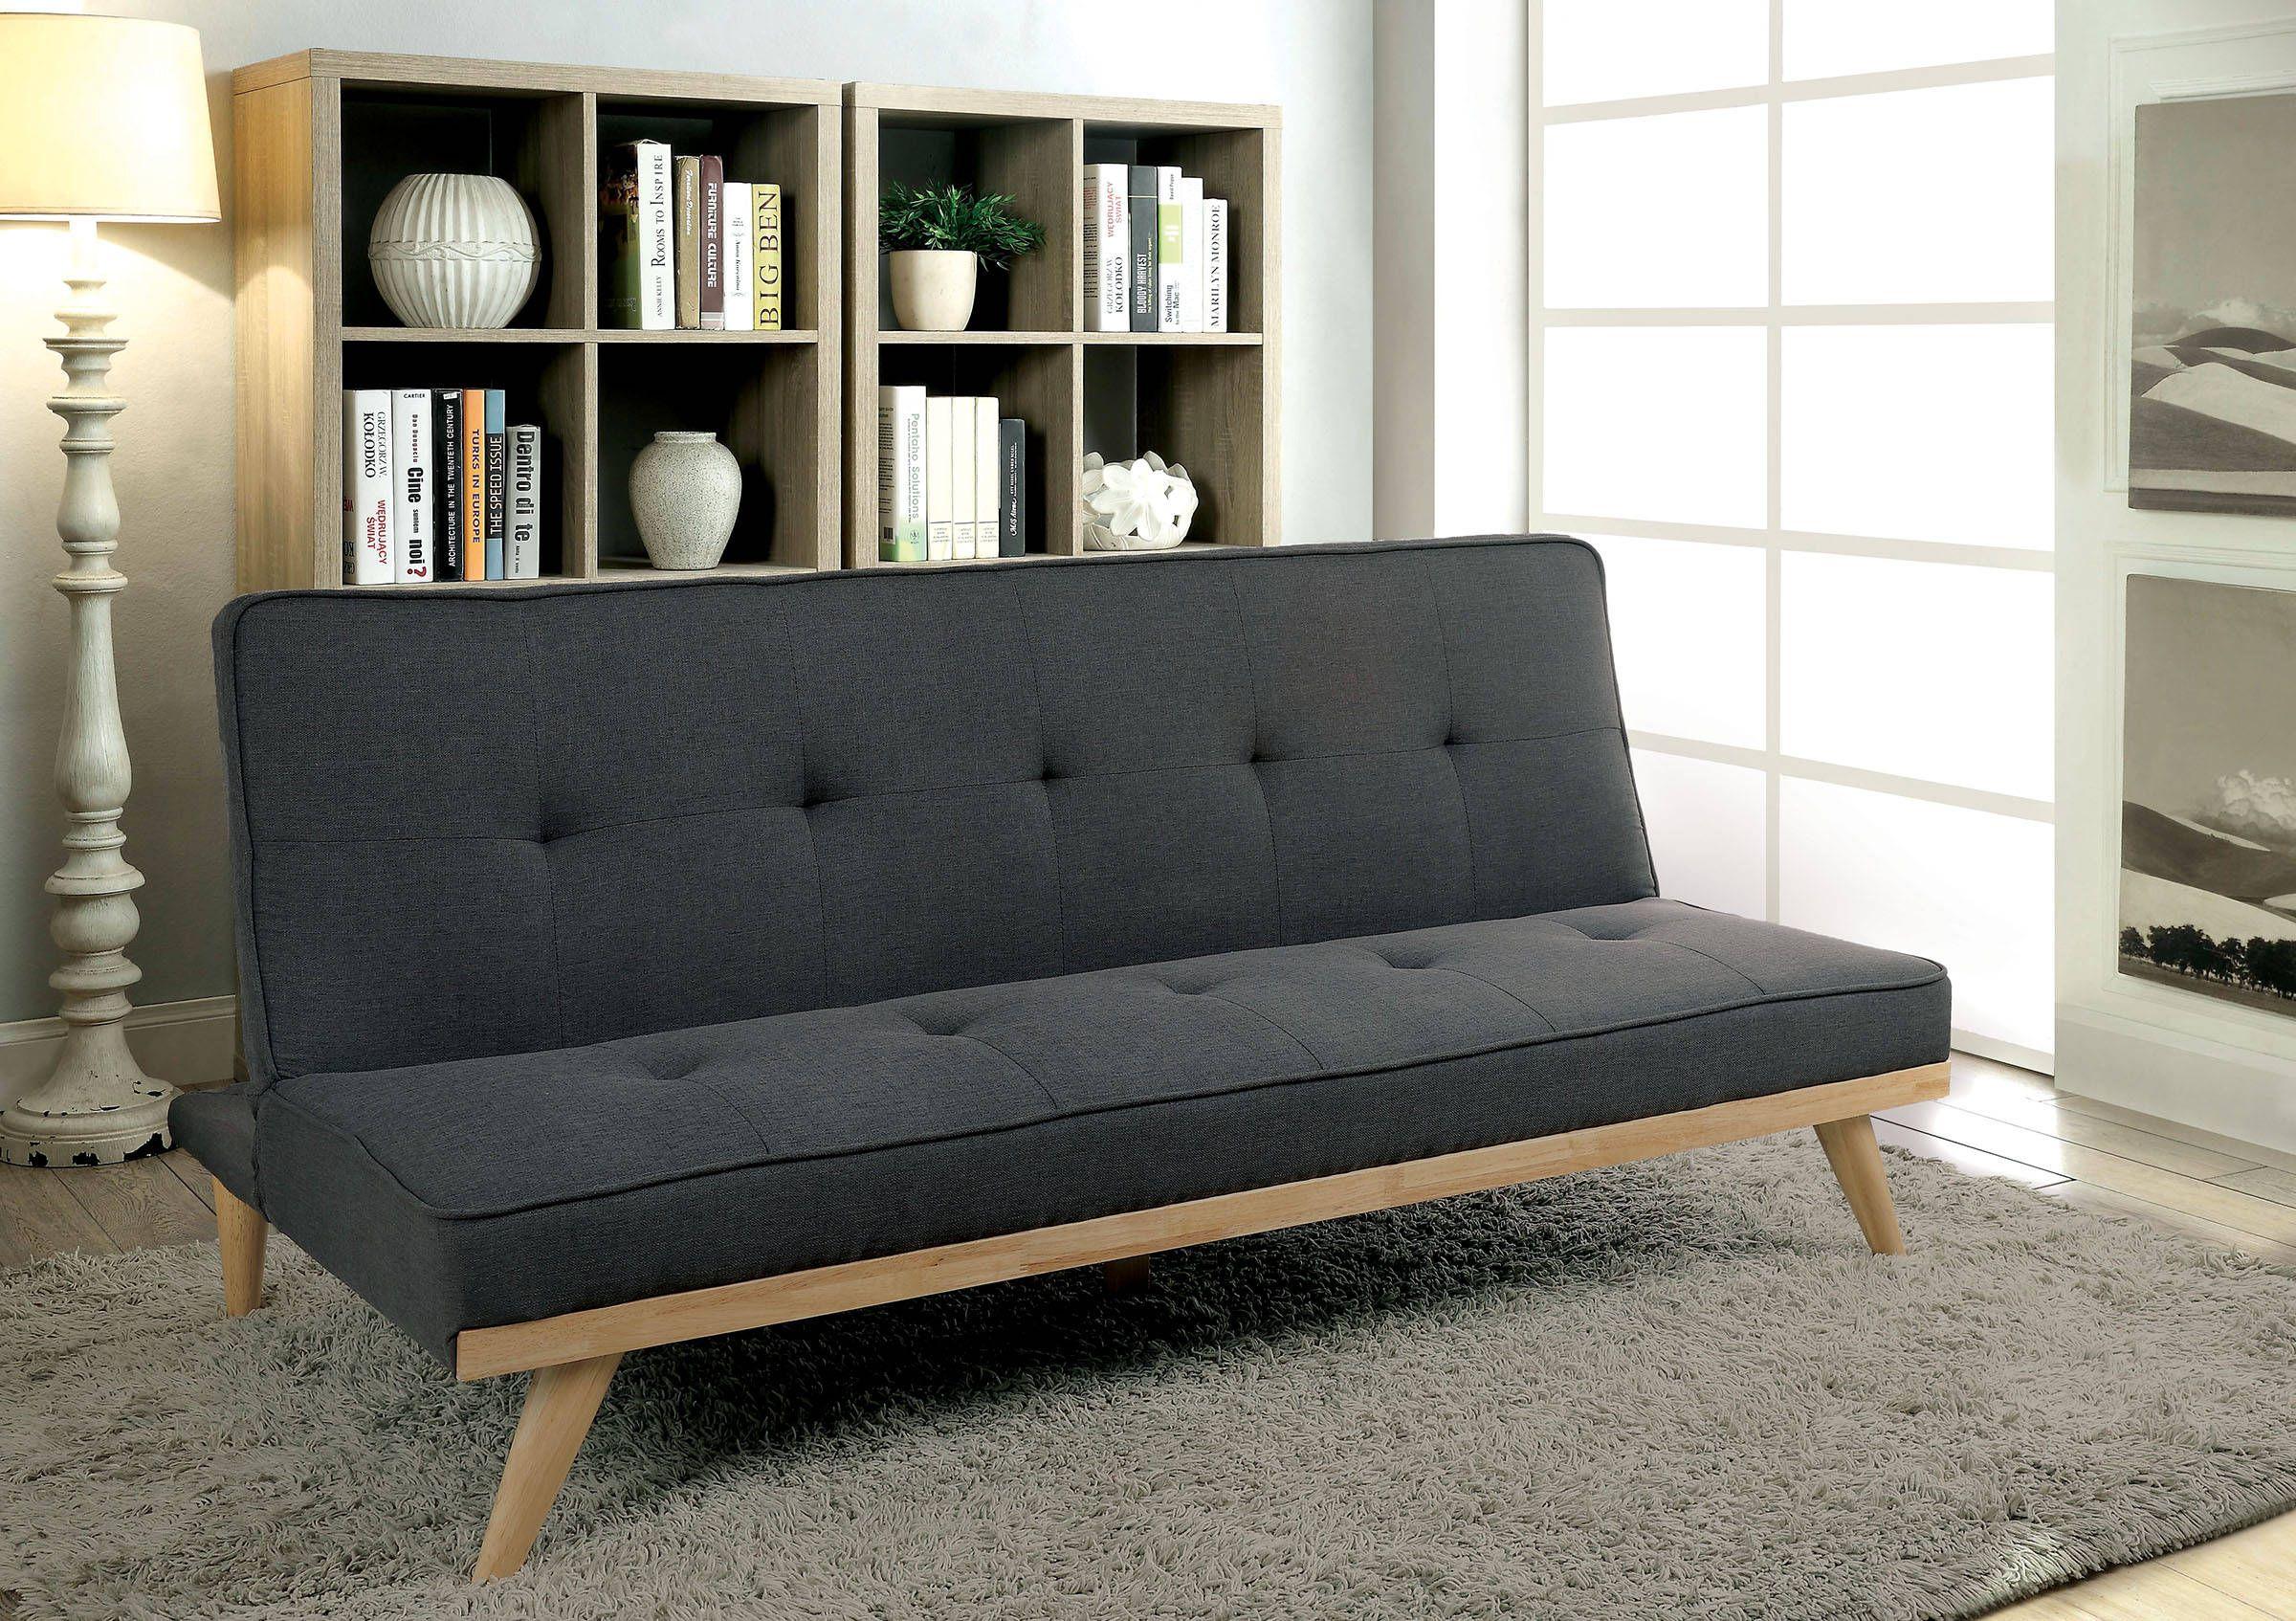 Lyra Contemporary Gray Fabric Futon Sofa | The Classy Home Furniture ...